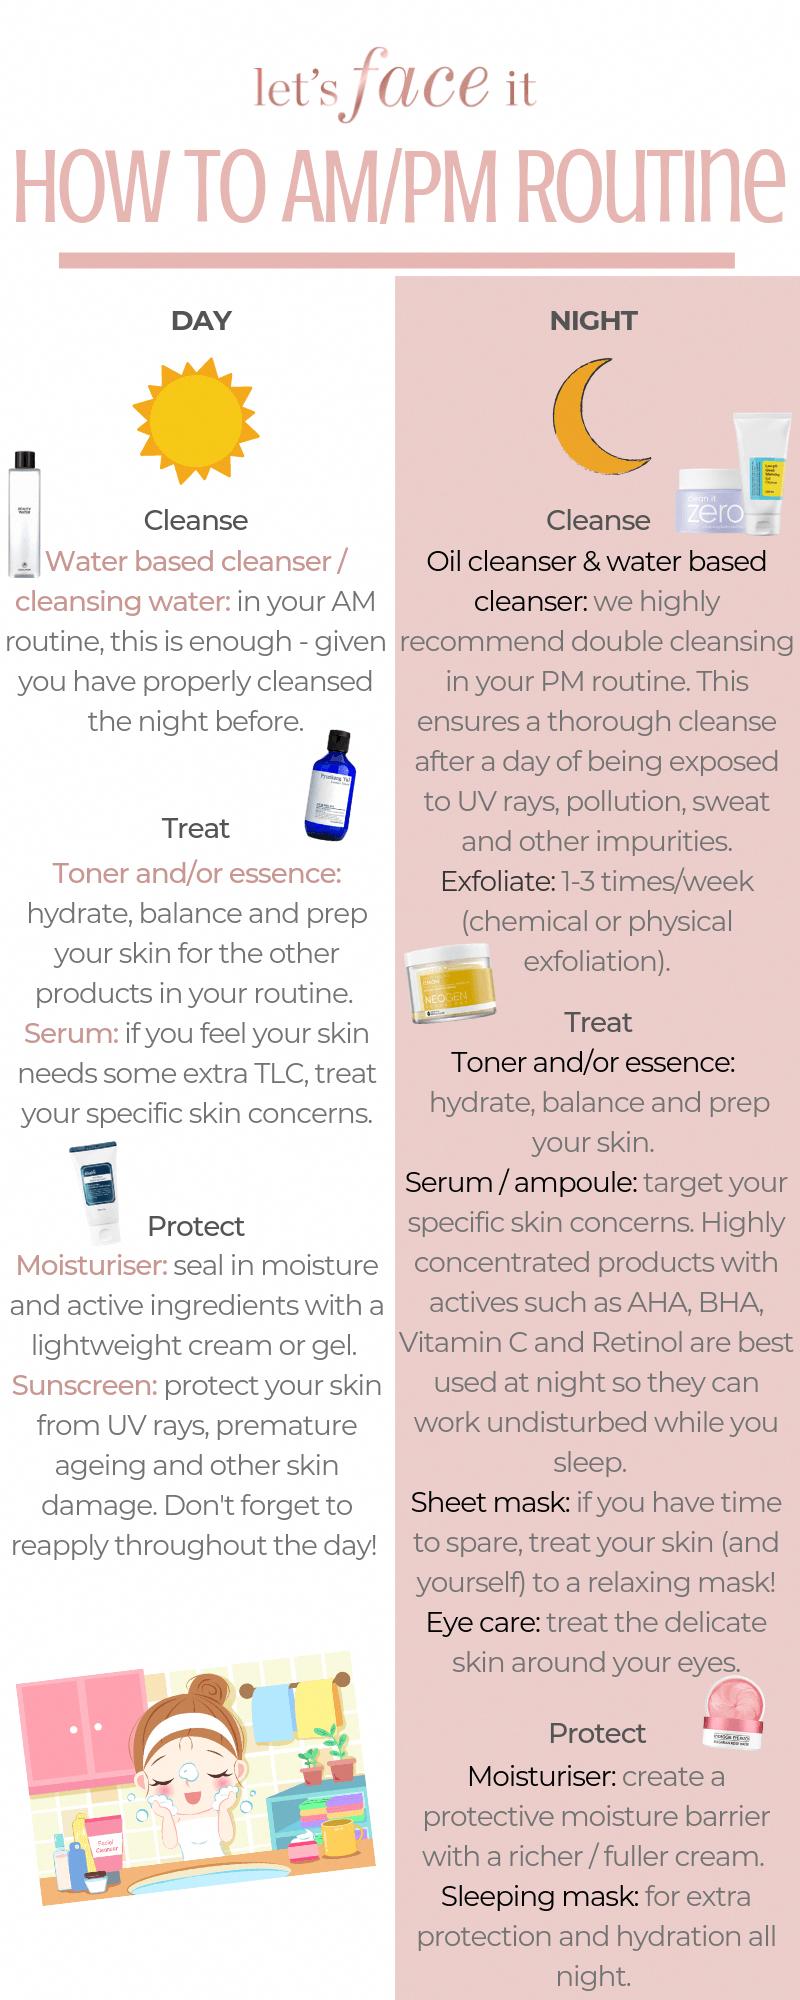 How To Korean Skincare Routine Day Night Night Skin Care Routine Korean Skincare Routine Skin Care Routine Steps